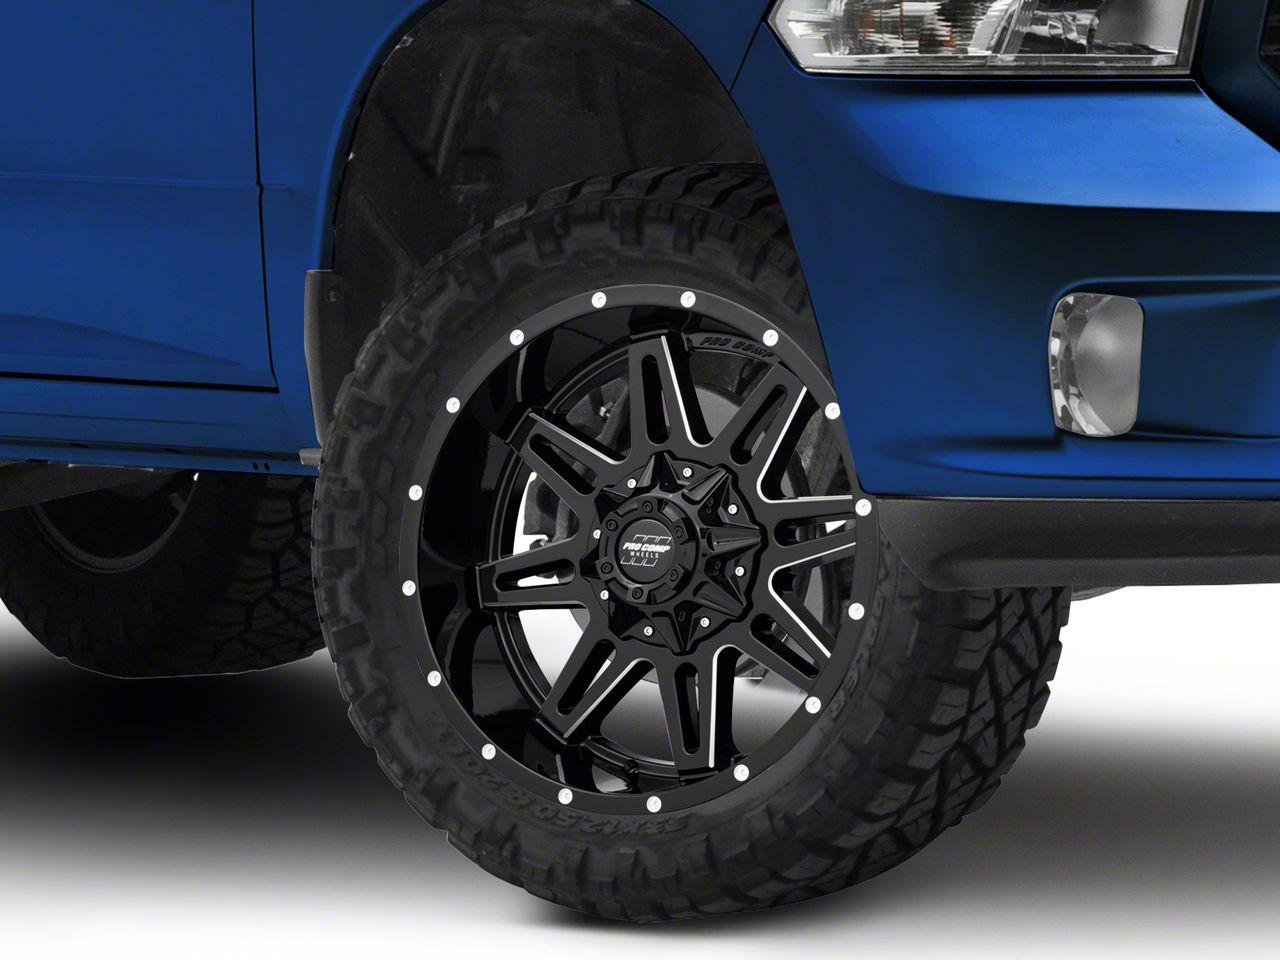 Pro Comp Blockade Gloss Black Milled 5-Lug Wheel - 20x9.5 (02-18 RAM 1500, Excluding Mega Cab)